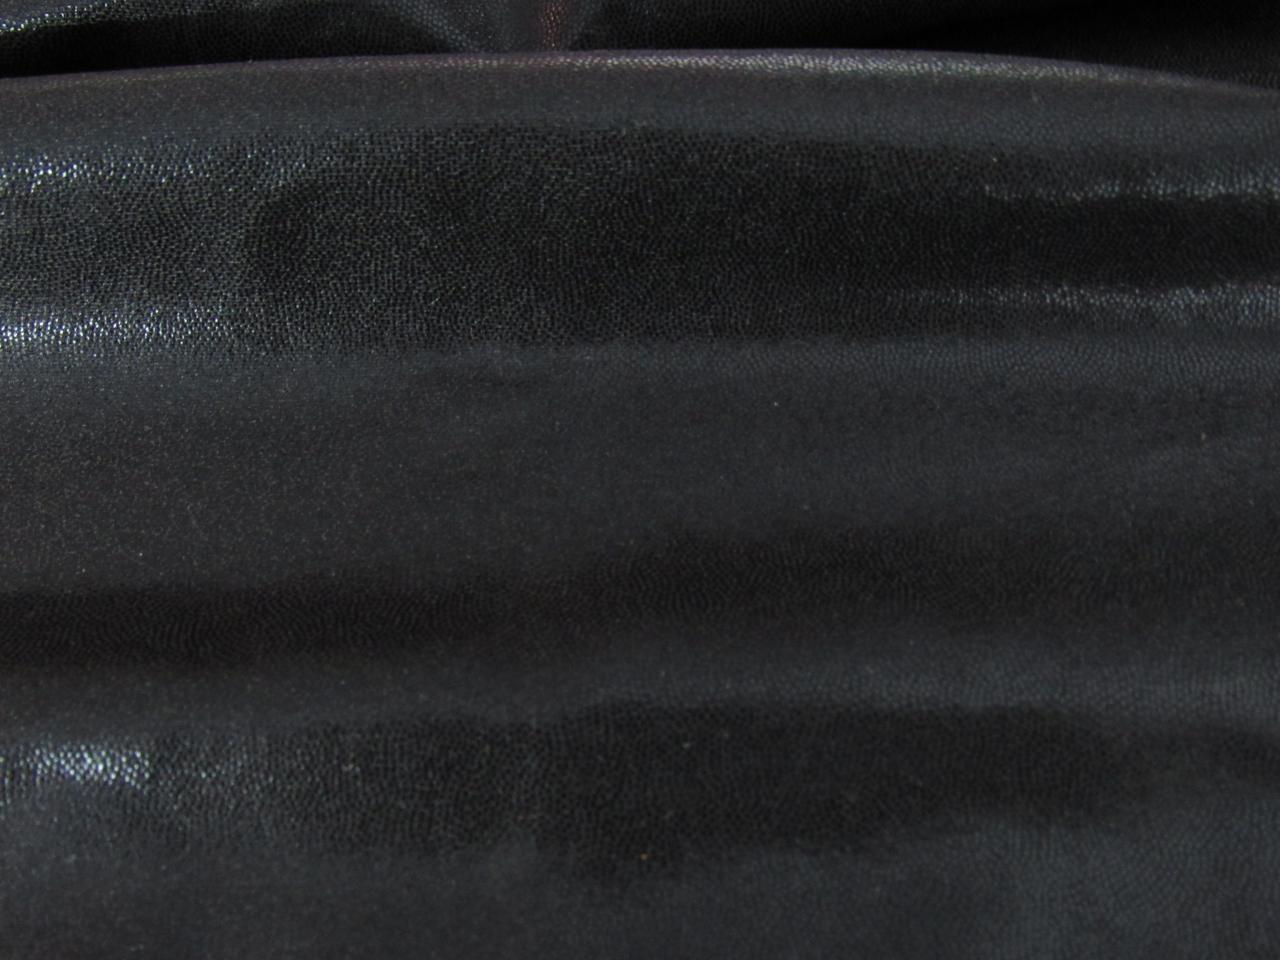 Black Lycra with black pin dots